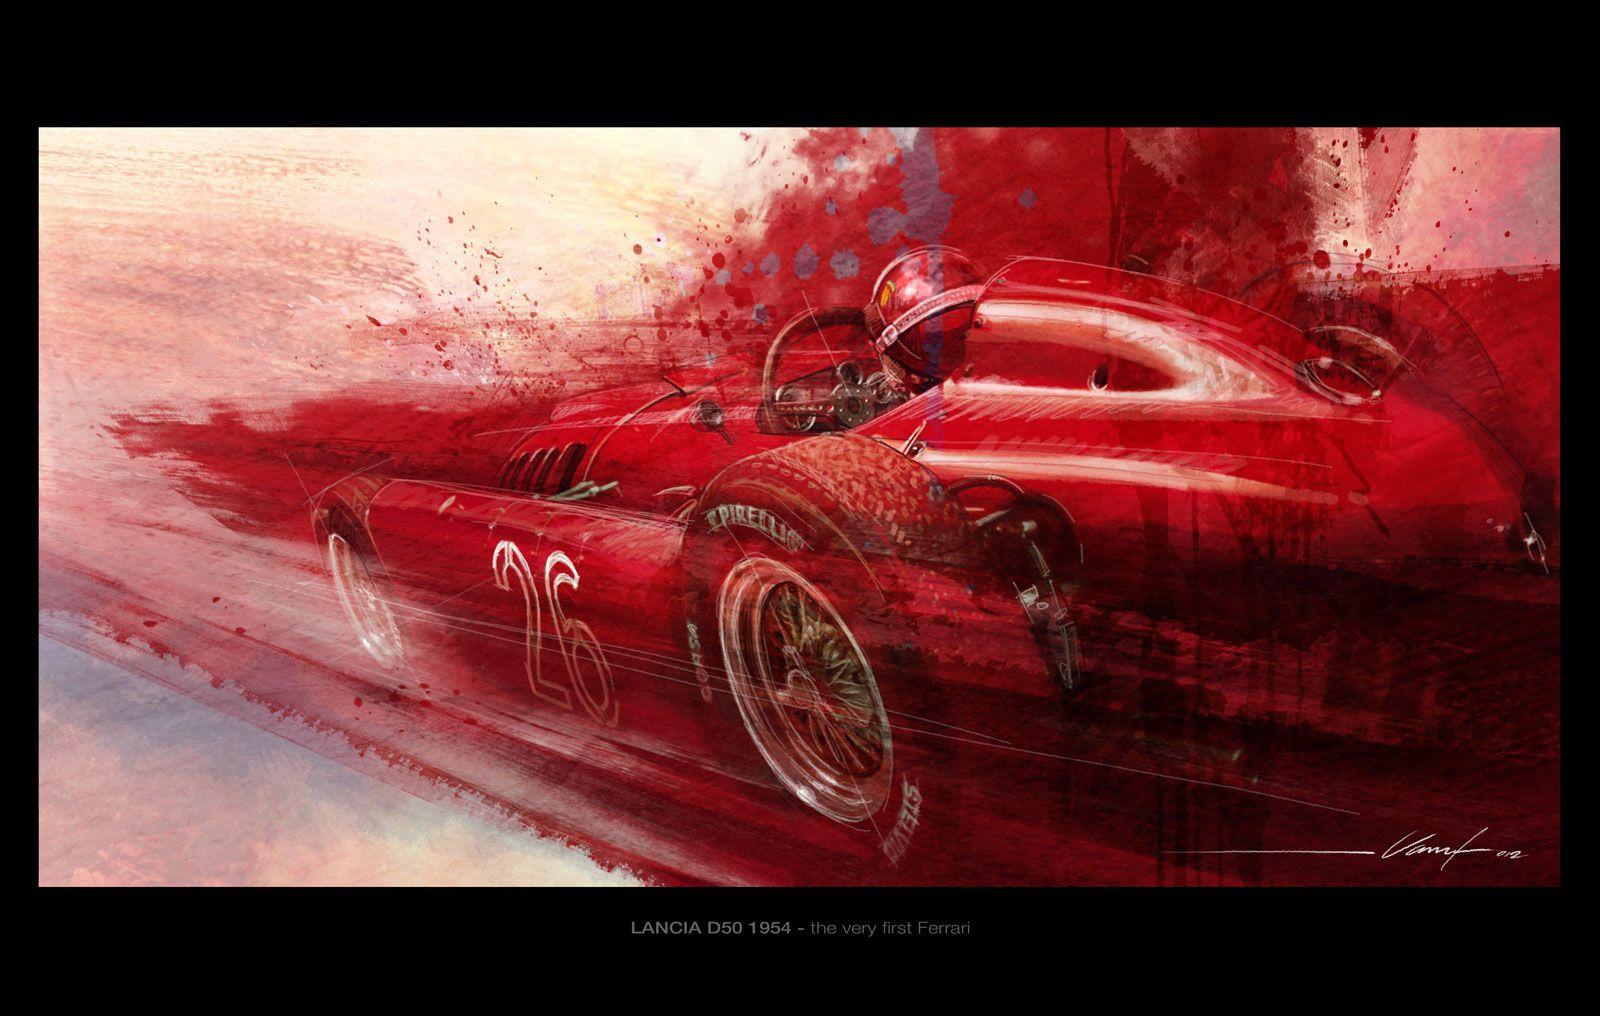 1954 lancia d50 sketch by jeanluc vanuf car body design garage 1954 lancia d50 sketch by jeanluc vanuf car body design vanachro Gallery